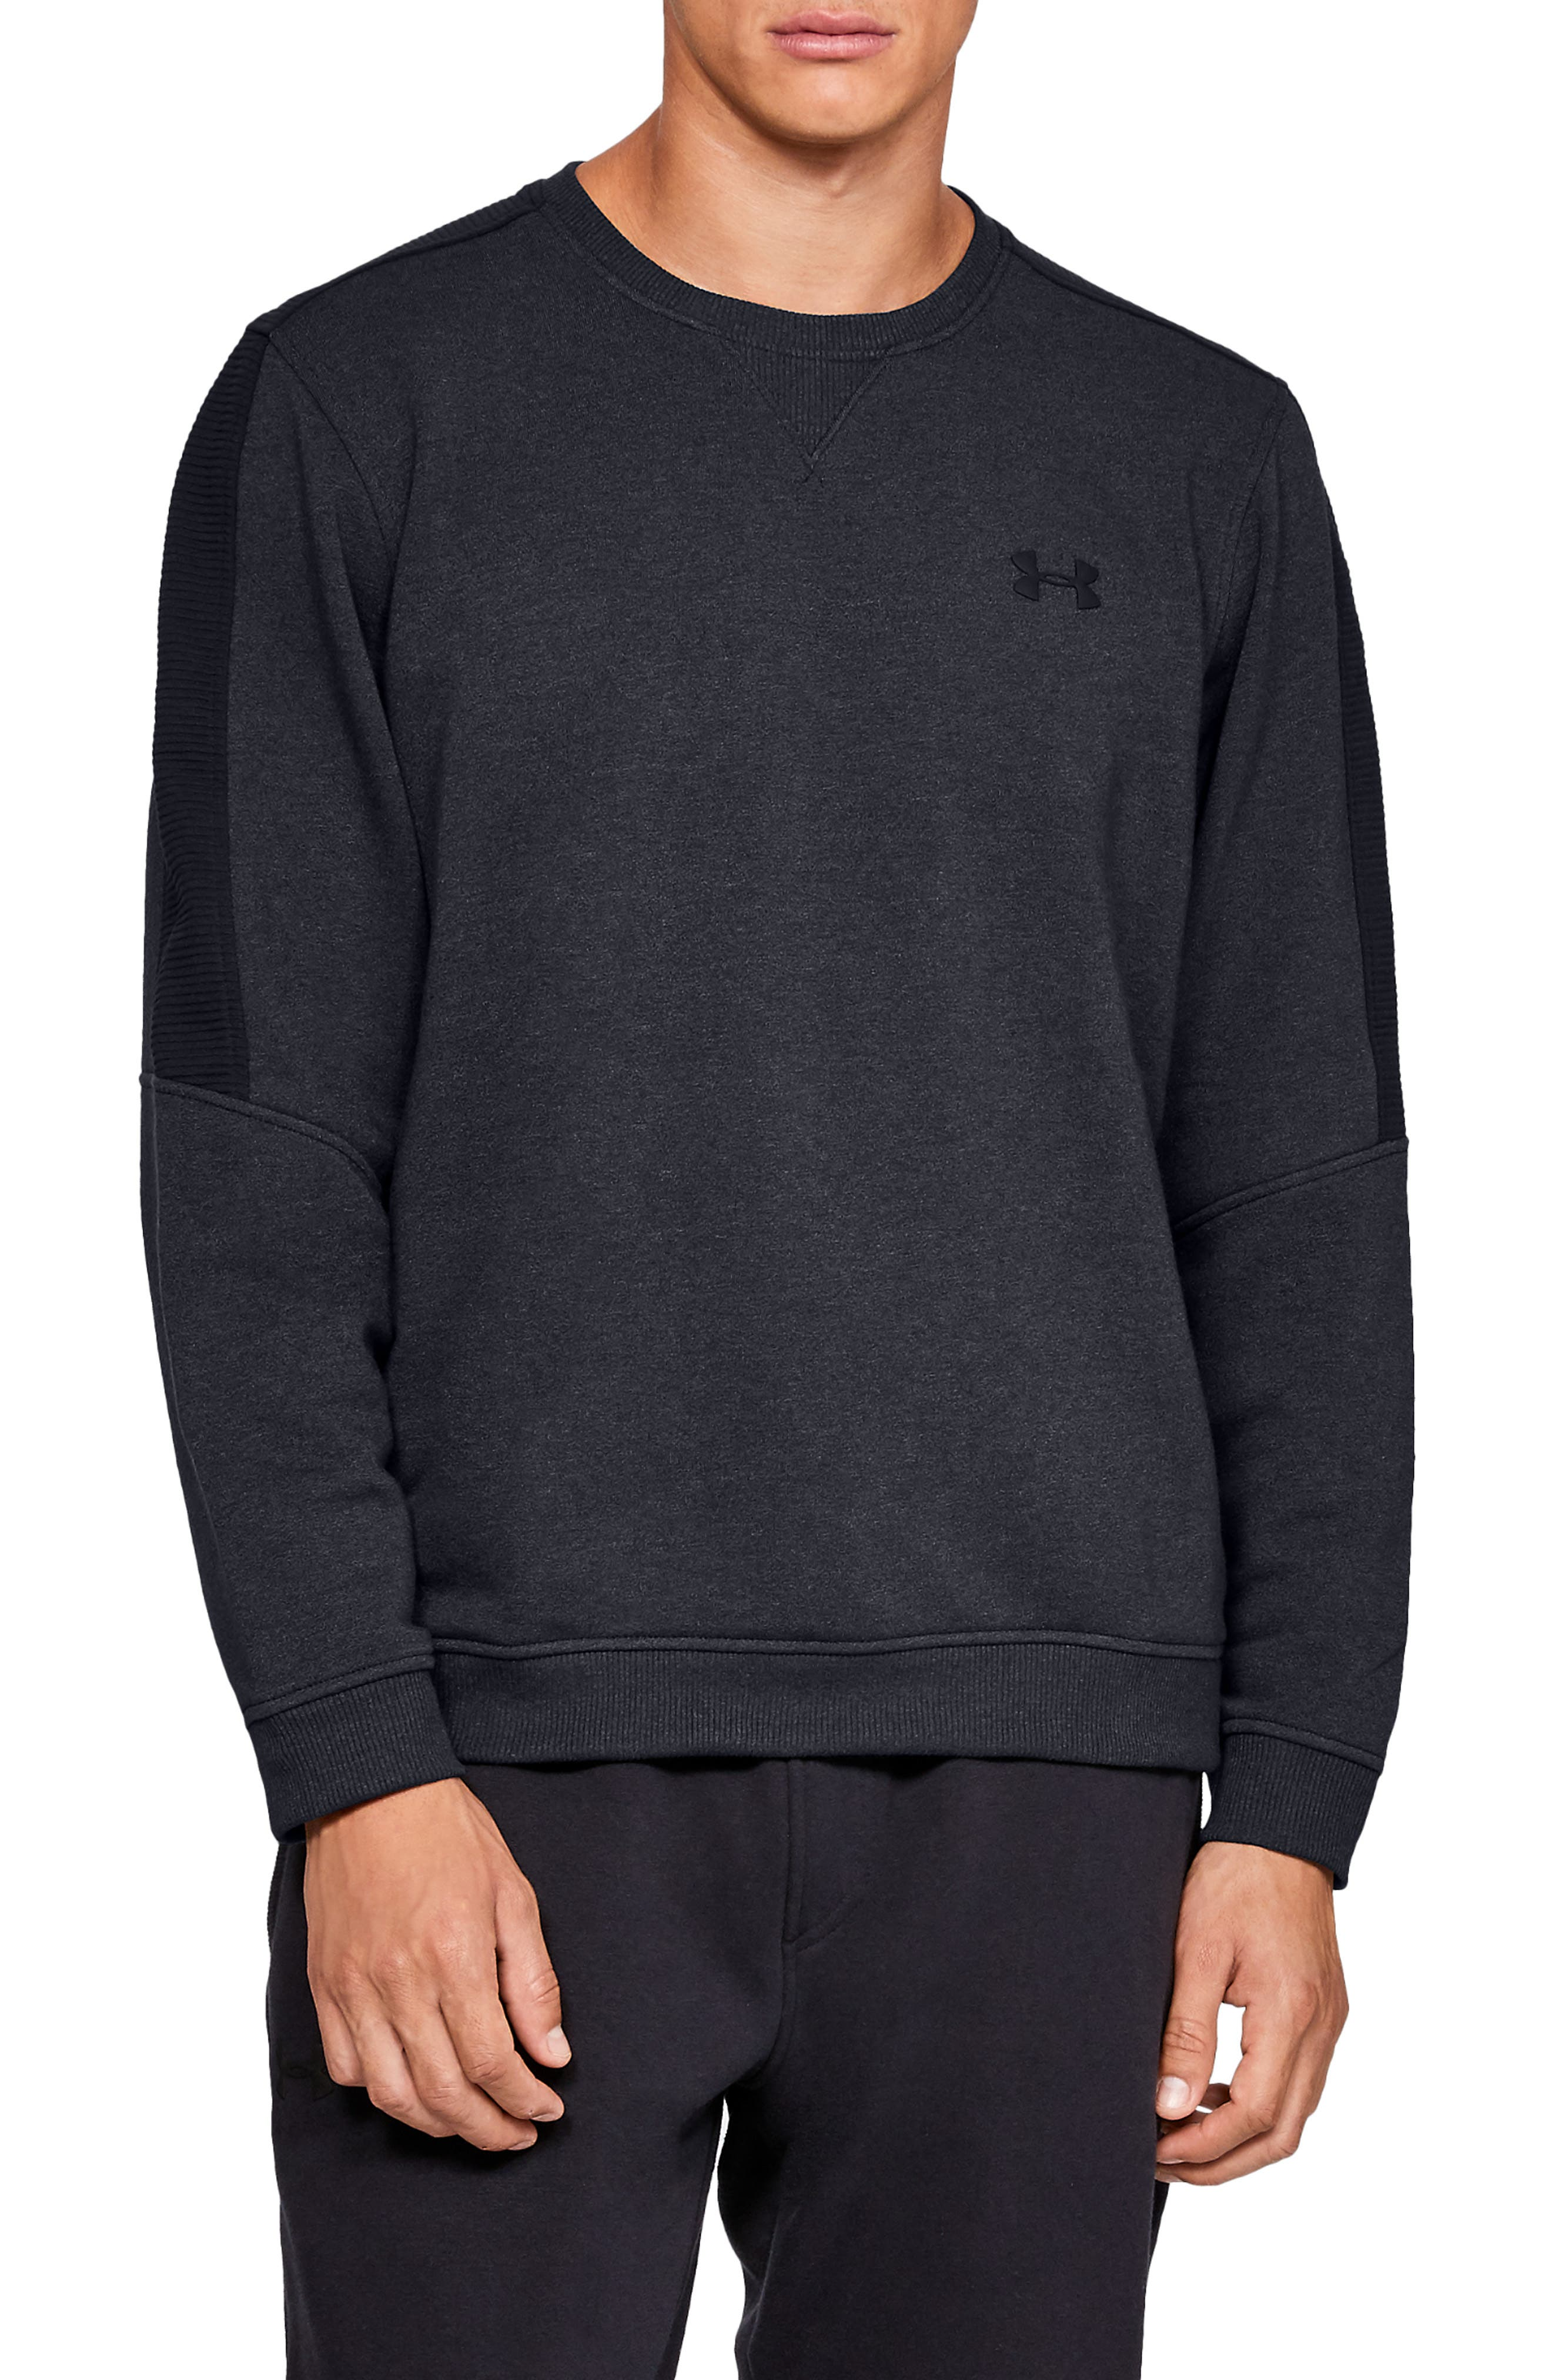 Threadborne Siro Fleece Crewneck Sweatshirt,                         Main,                         color, BLACK/ BLACK/ BLACK